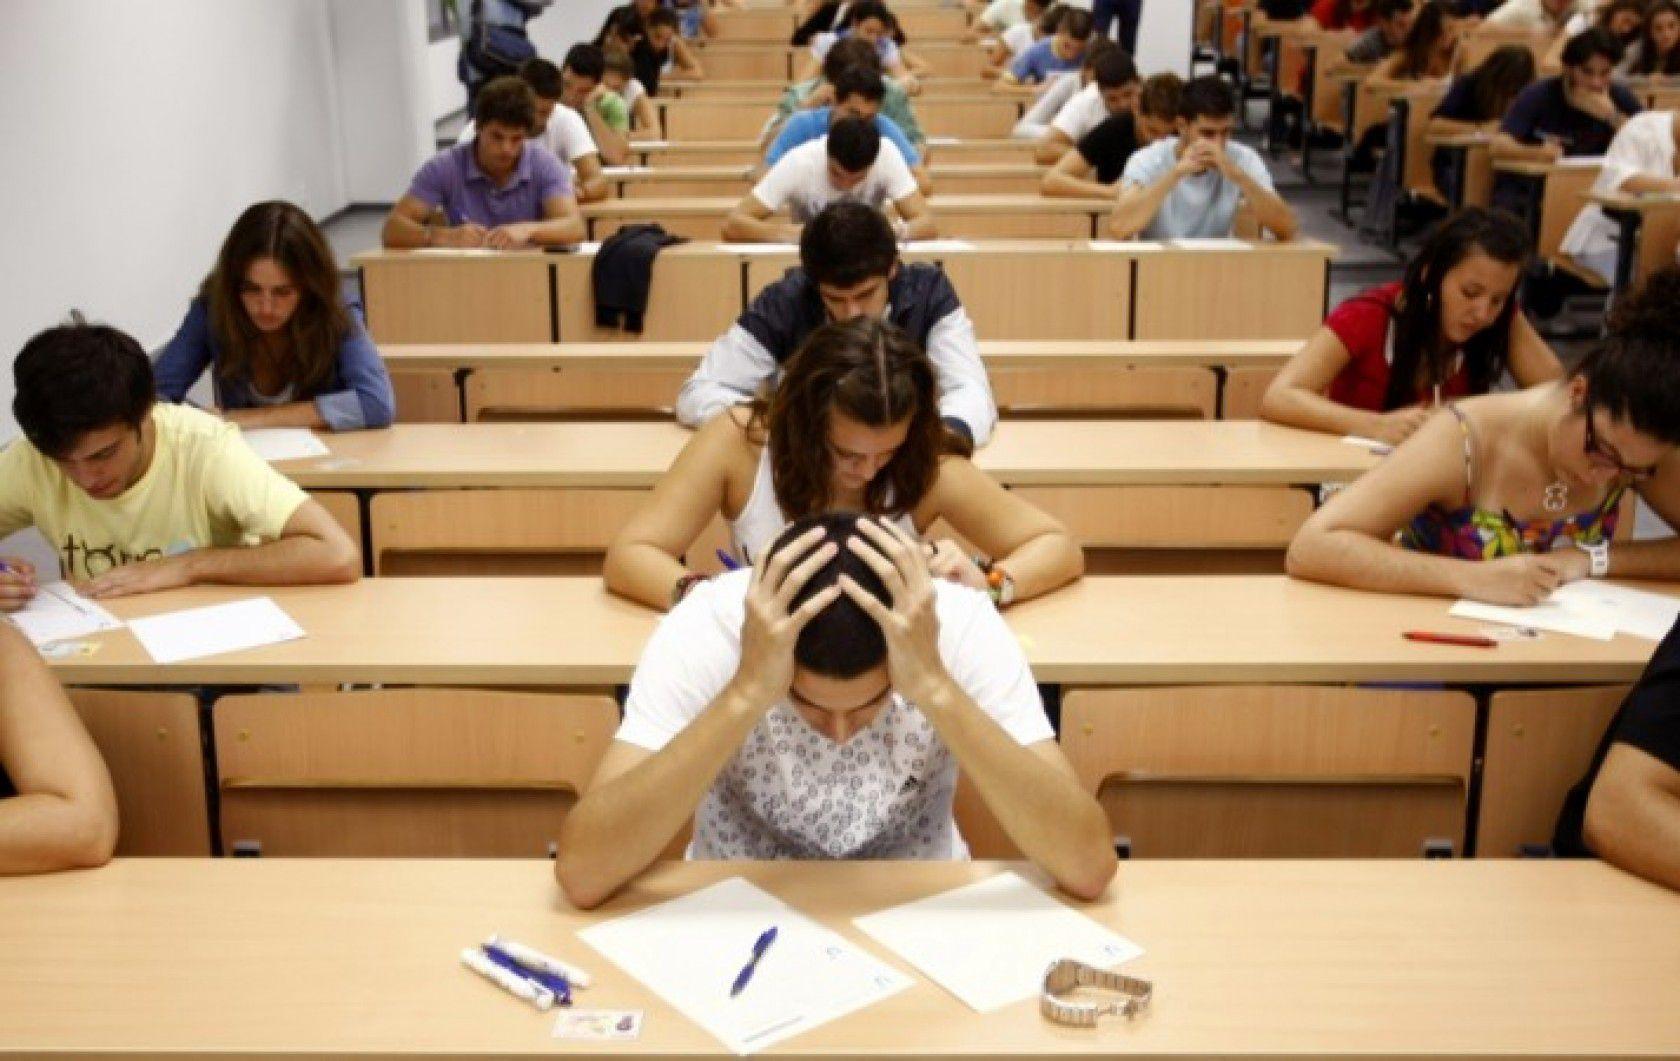 IELTS Sınavı Hazırlığında Bootcamp Yöntemi